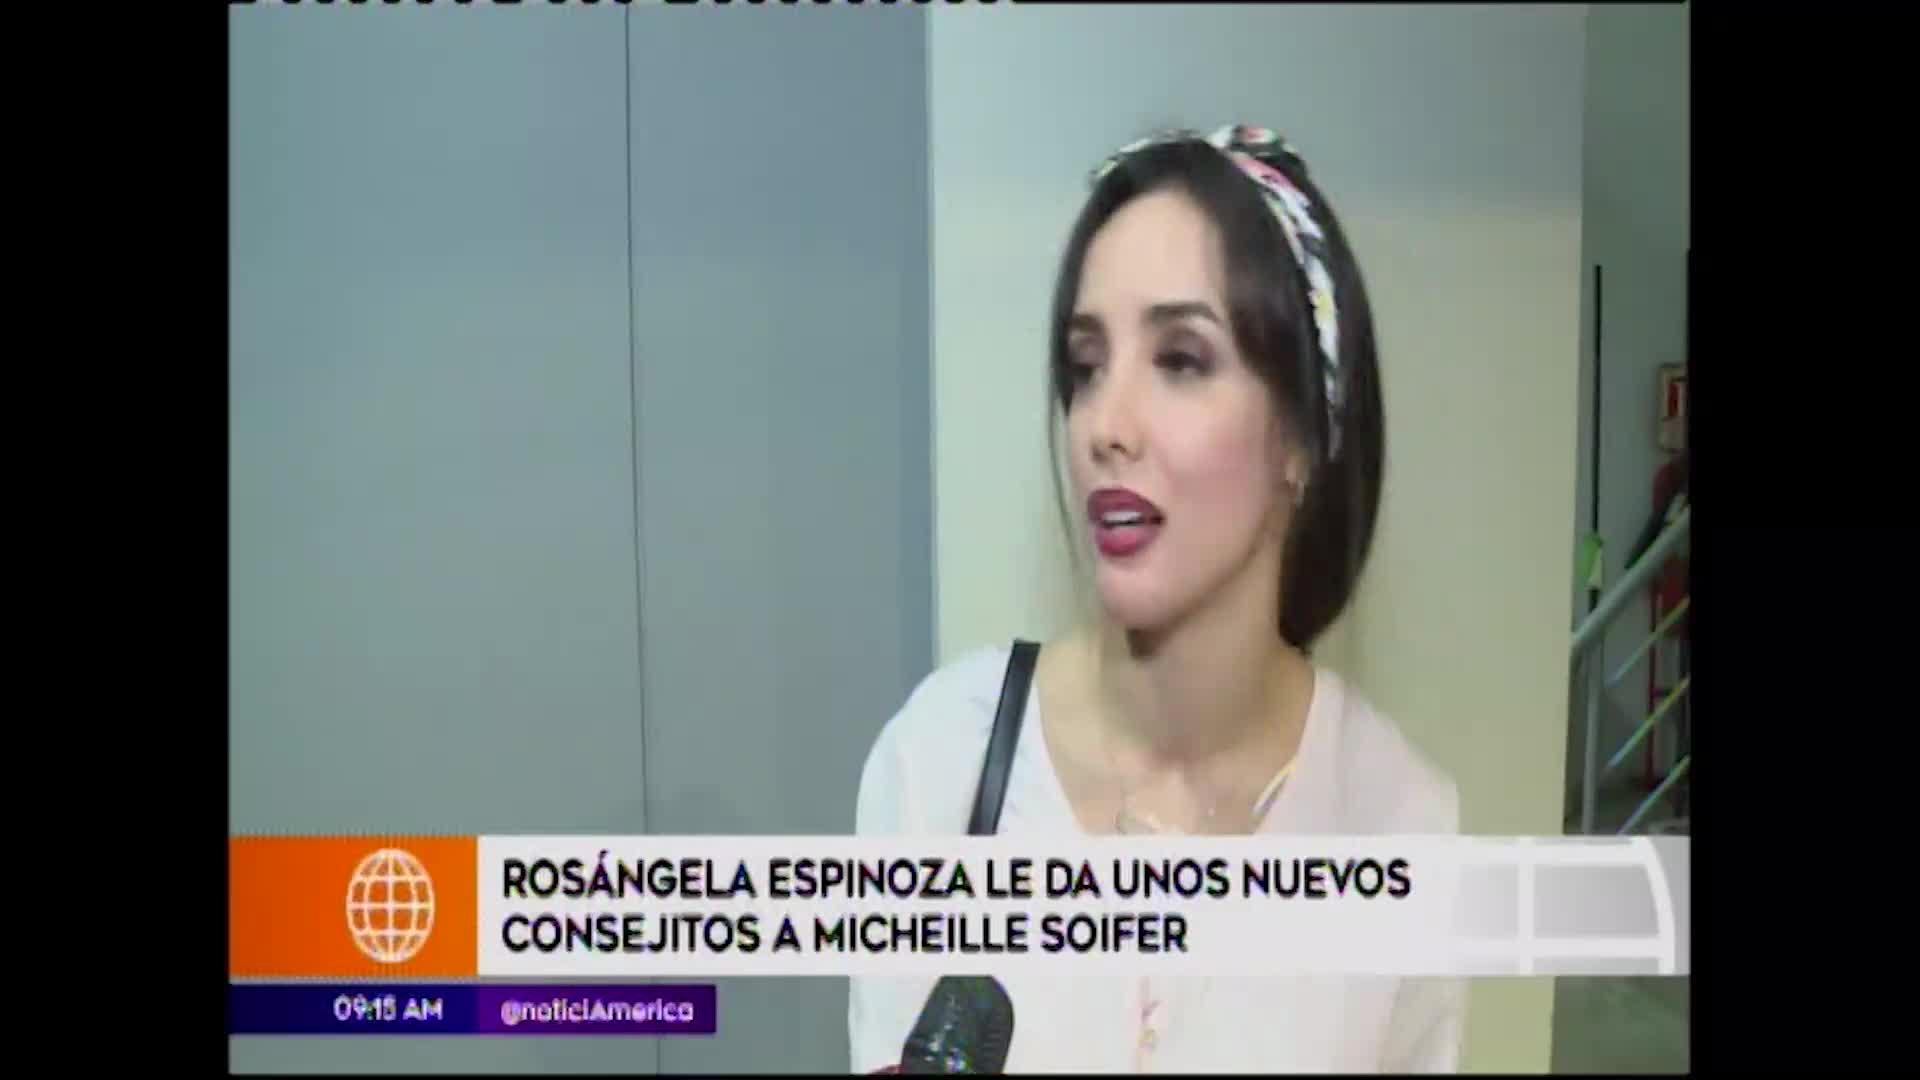 Esto es guerra: Rosángela Espinoza le da consejos a Michelle Soifer